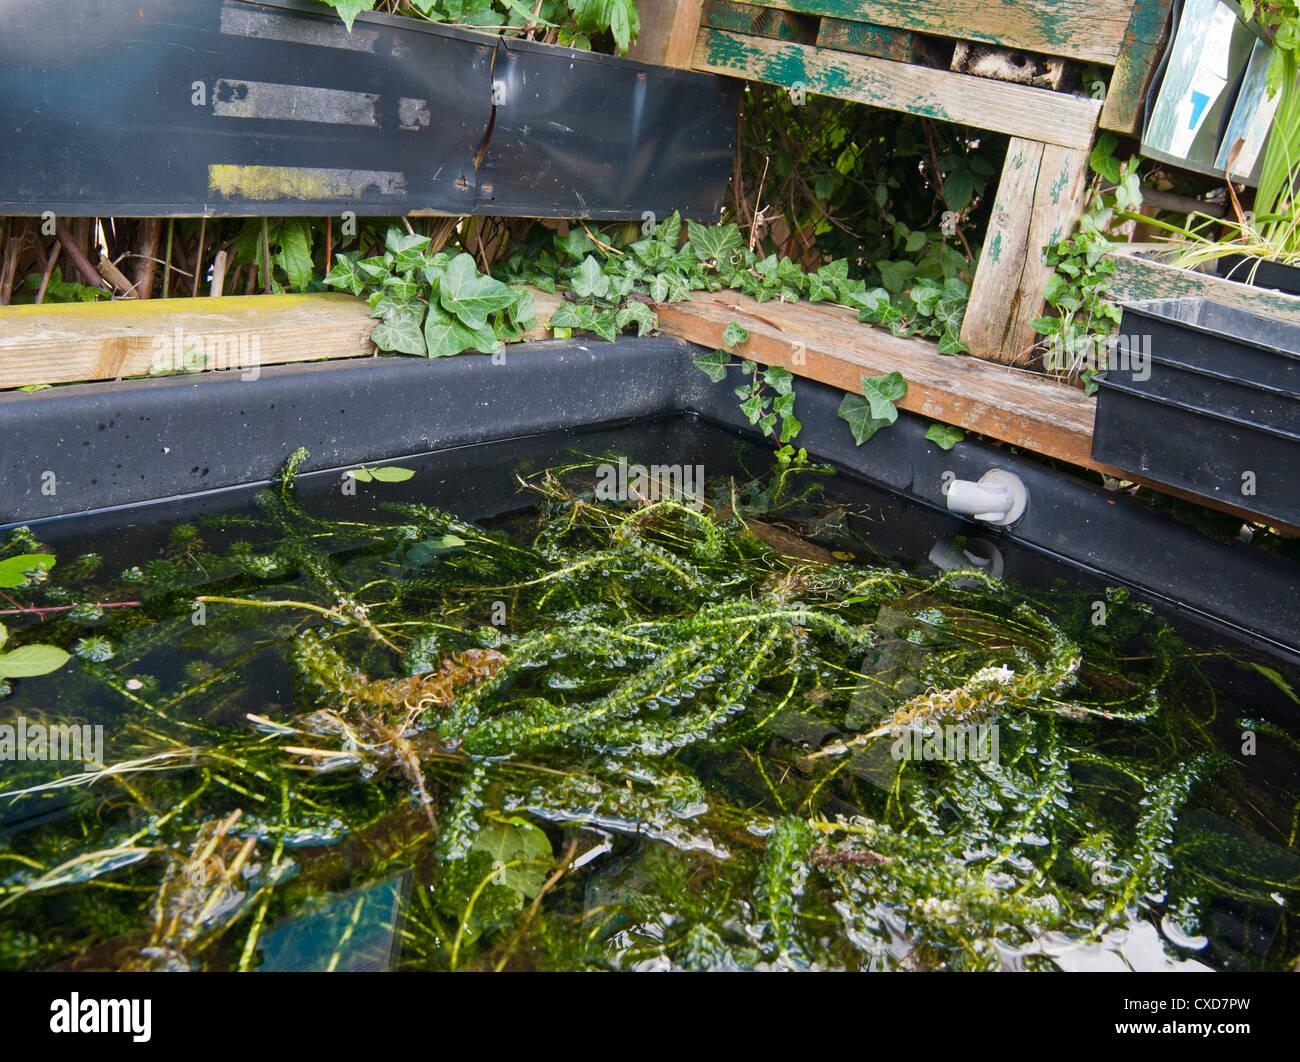 Oxygenating and floating plants elodea crispa for sale for Oxygenating pond plants for sale